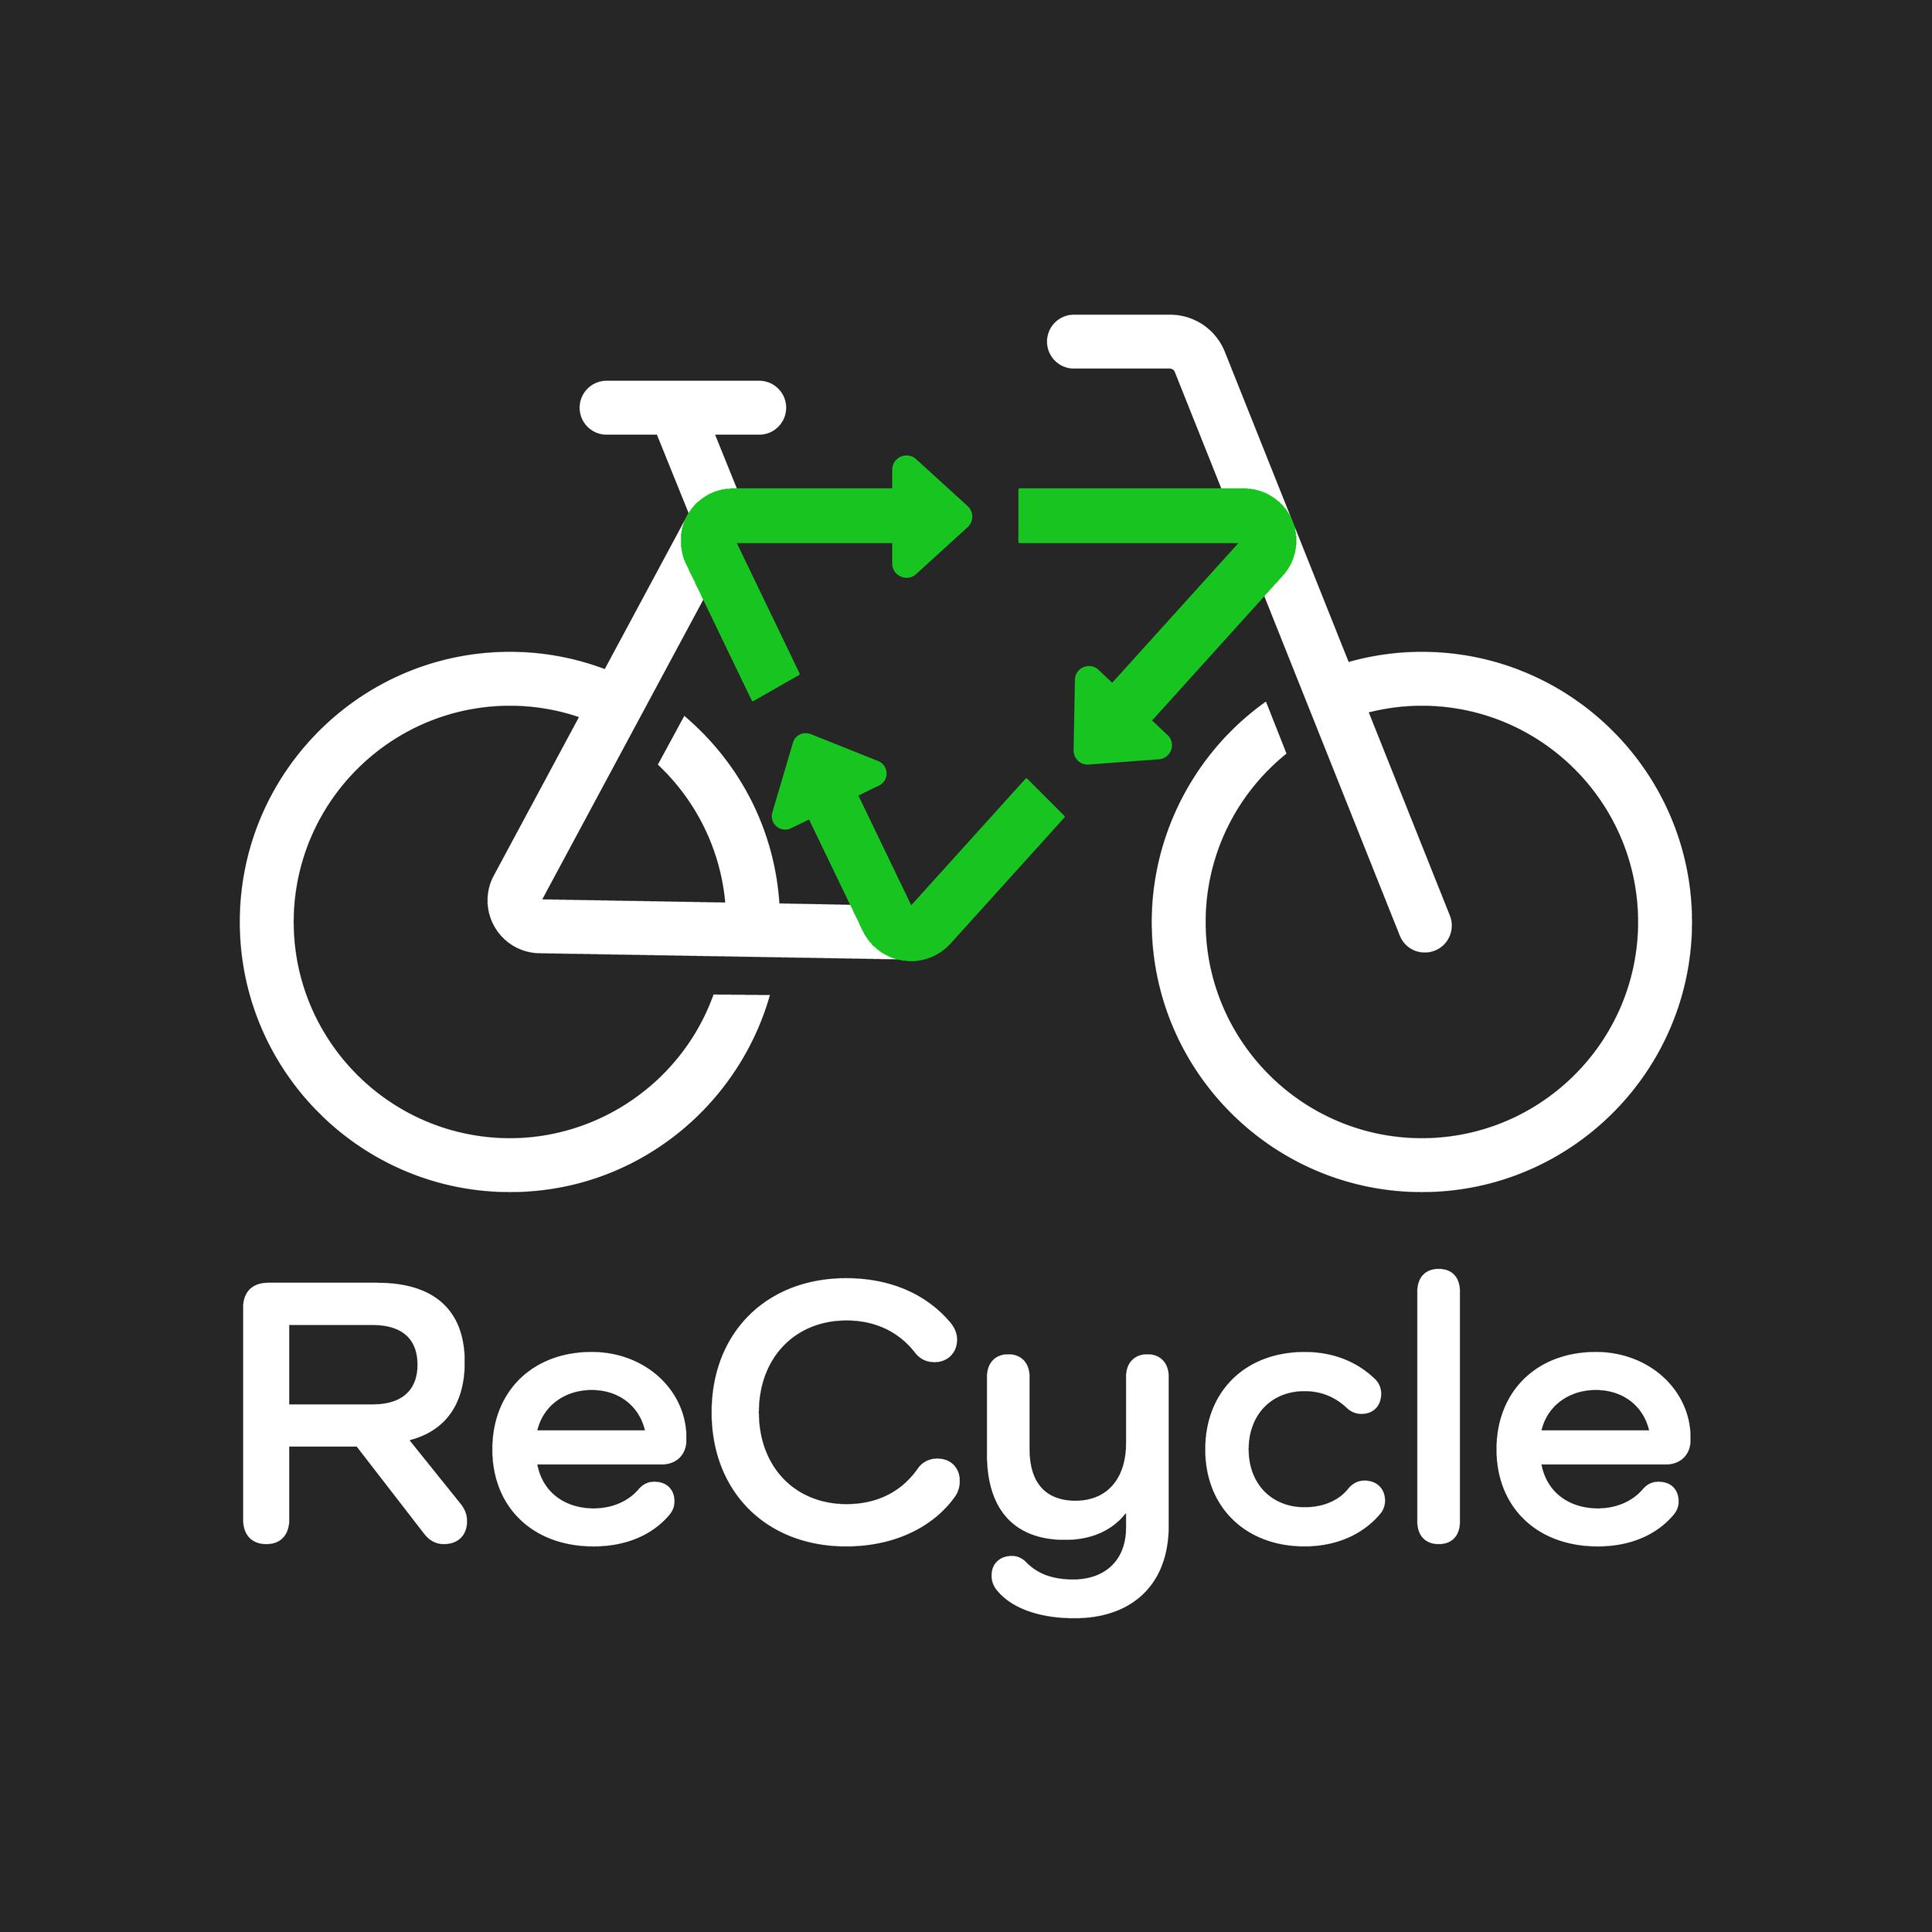 RecycleLogoMockup.png